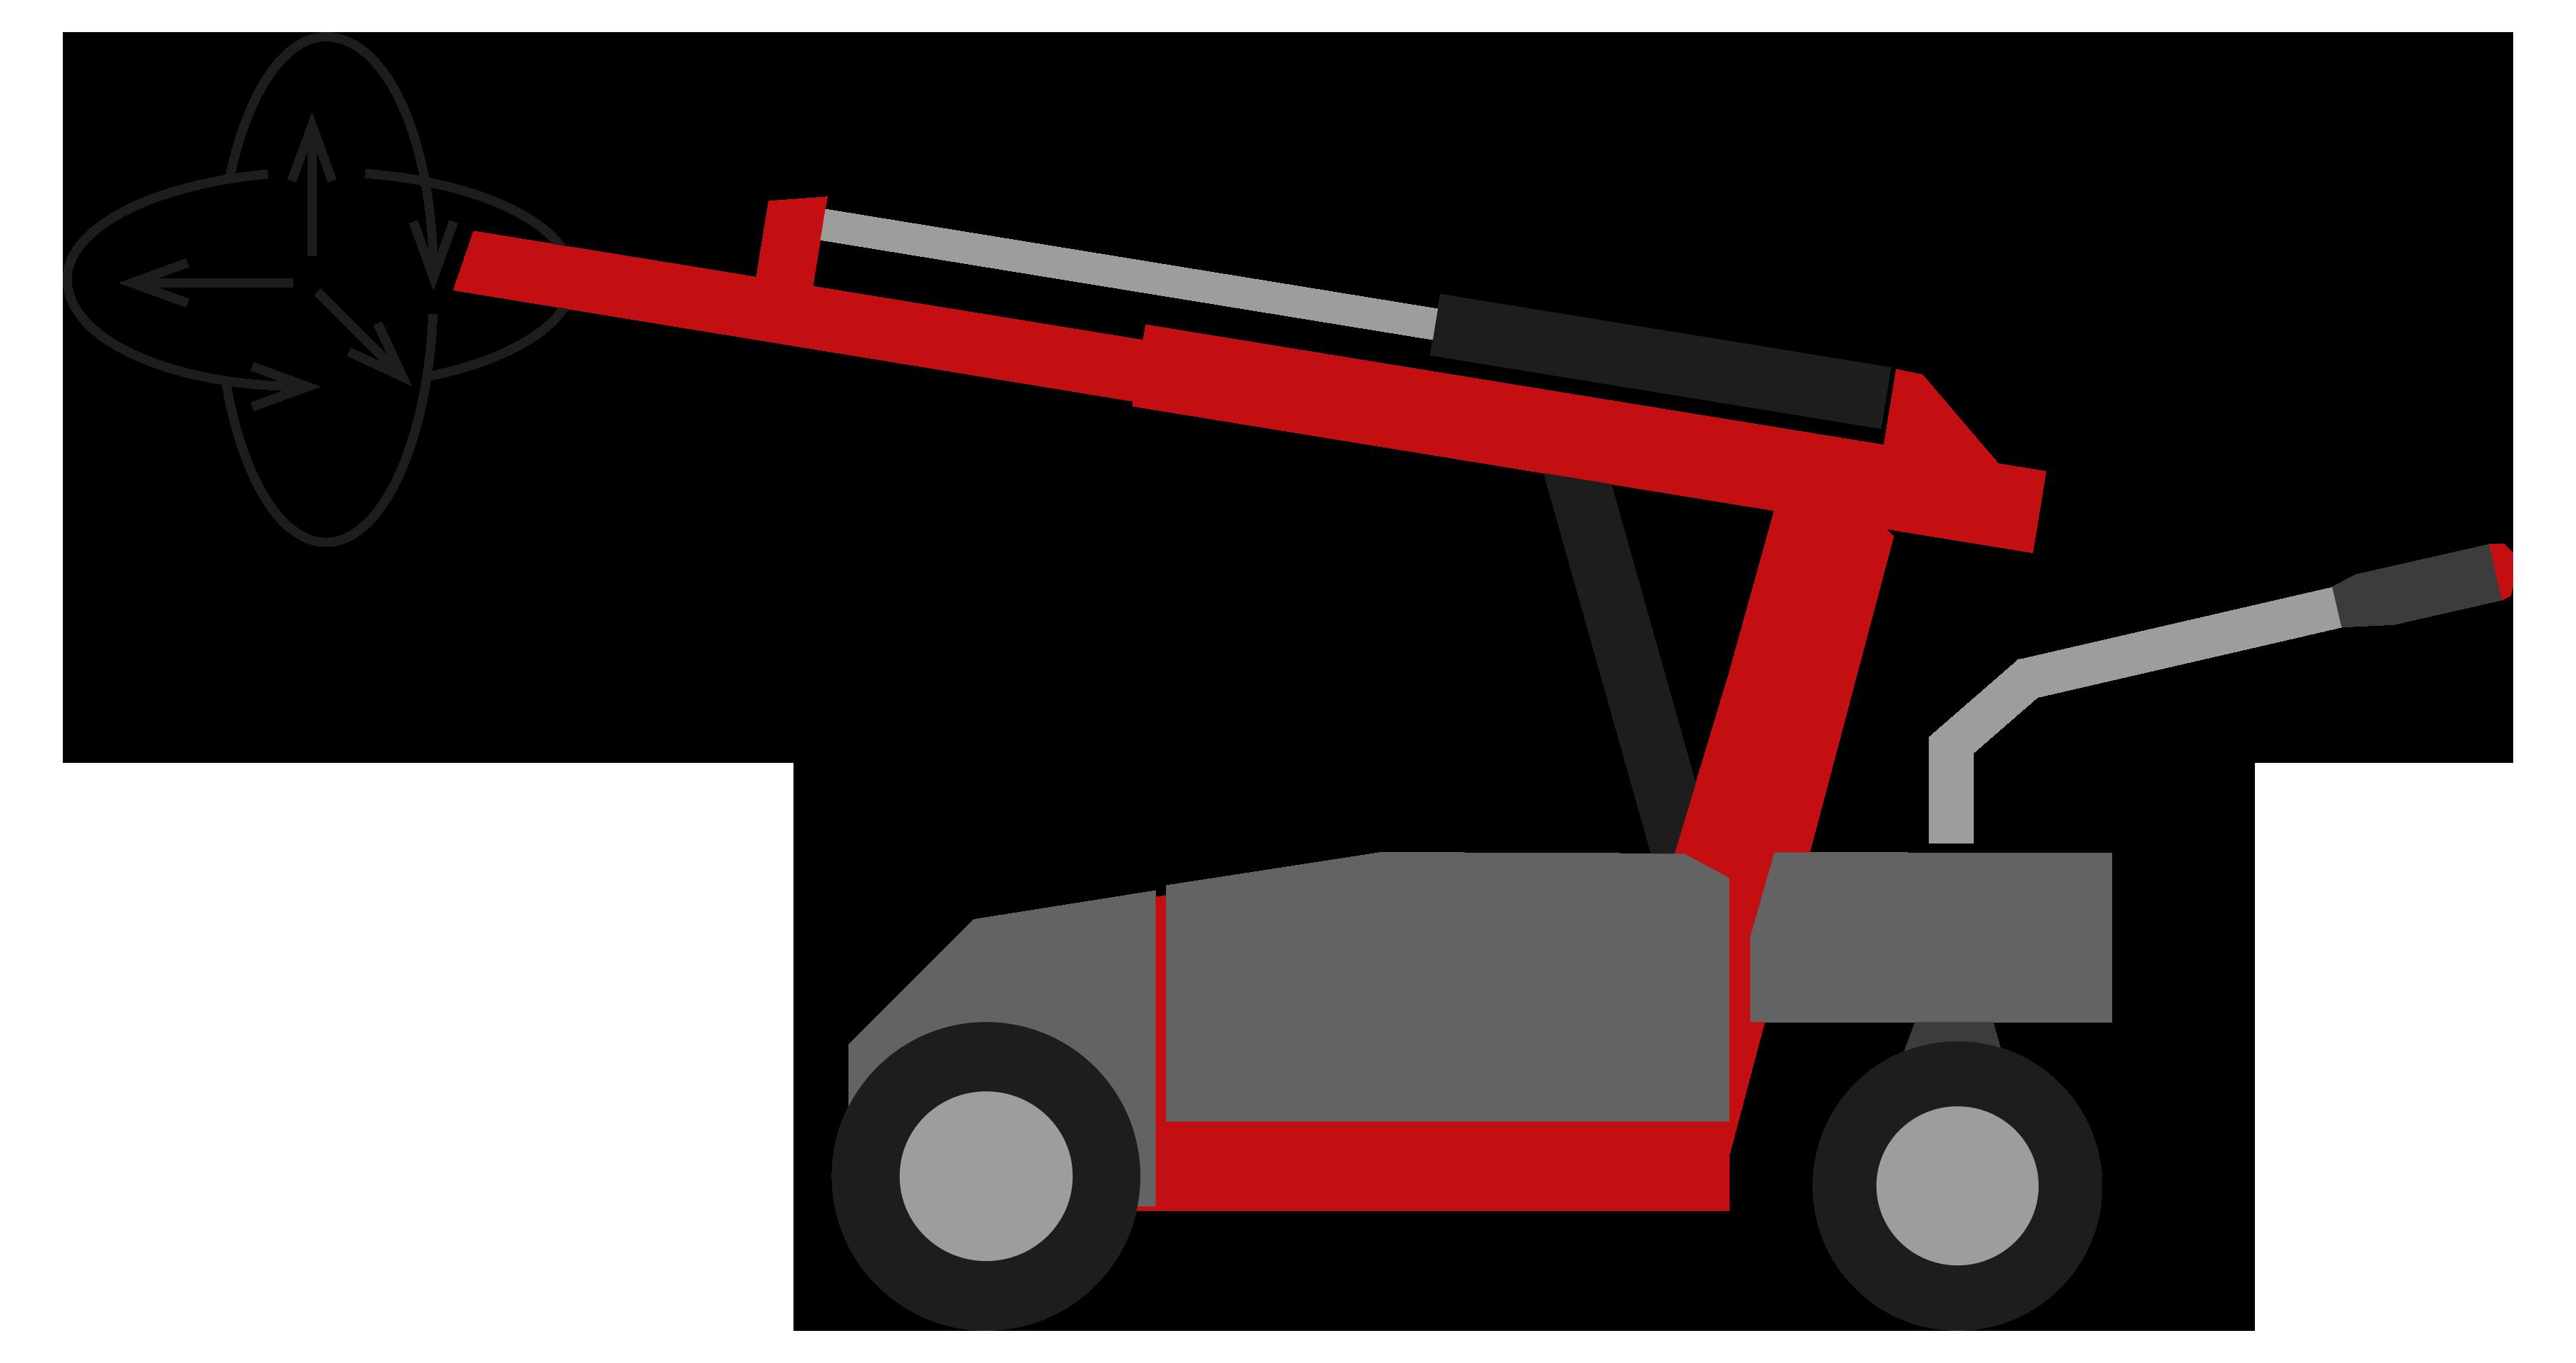 Industrie Manipulator horizontal, vertikal alle 3 Dimensionen